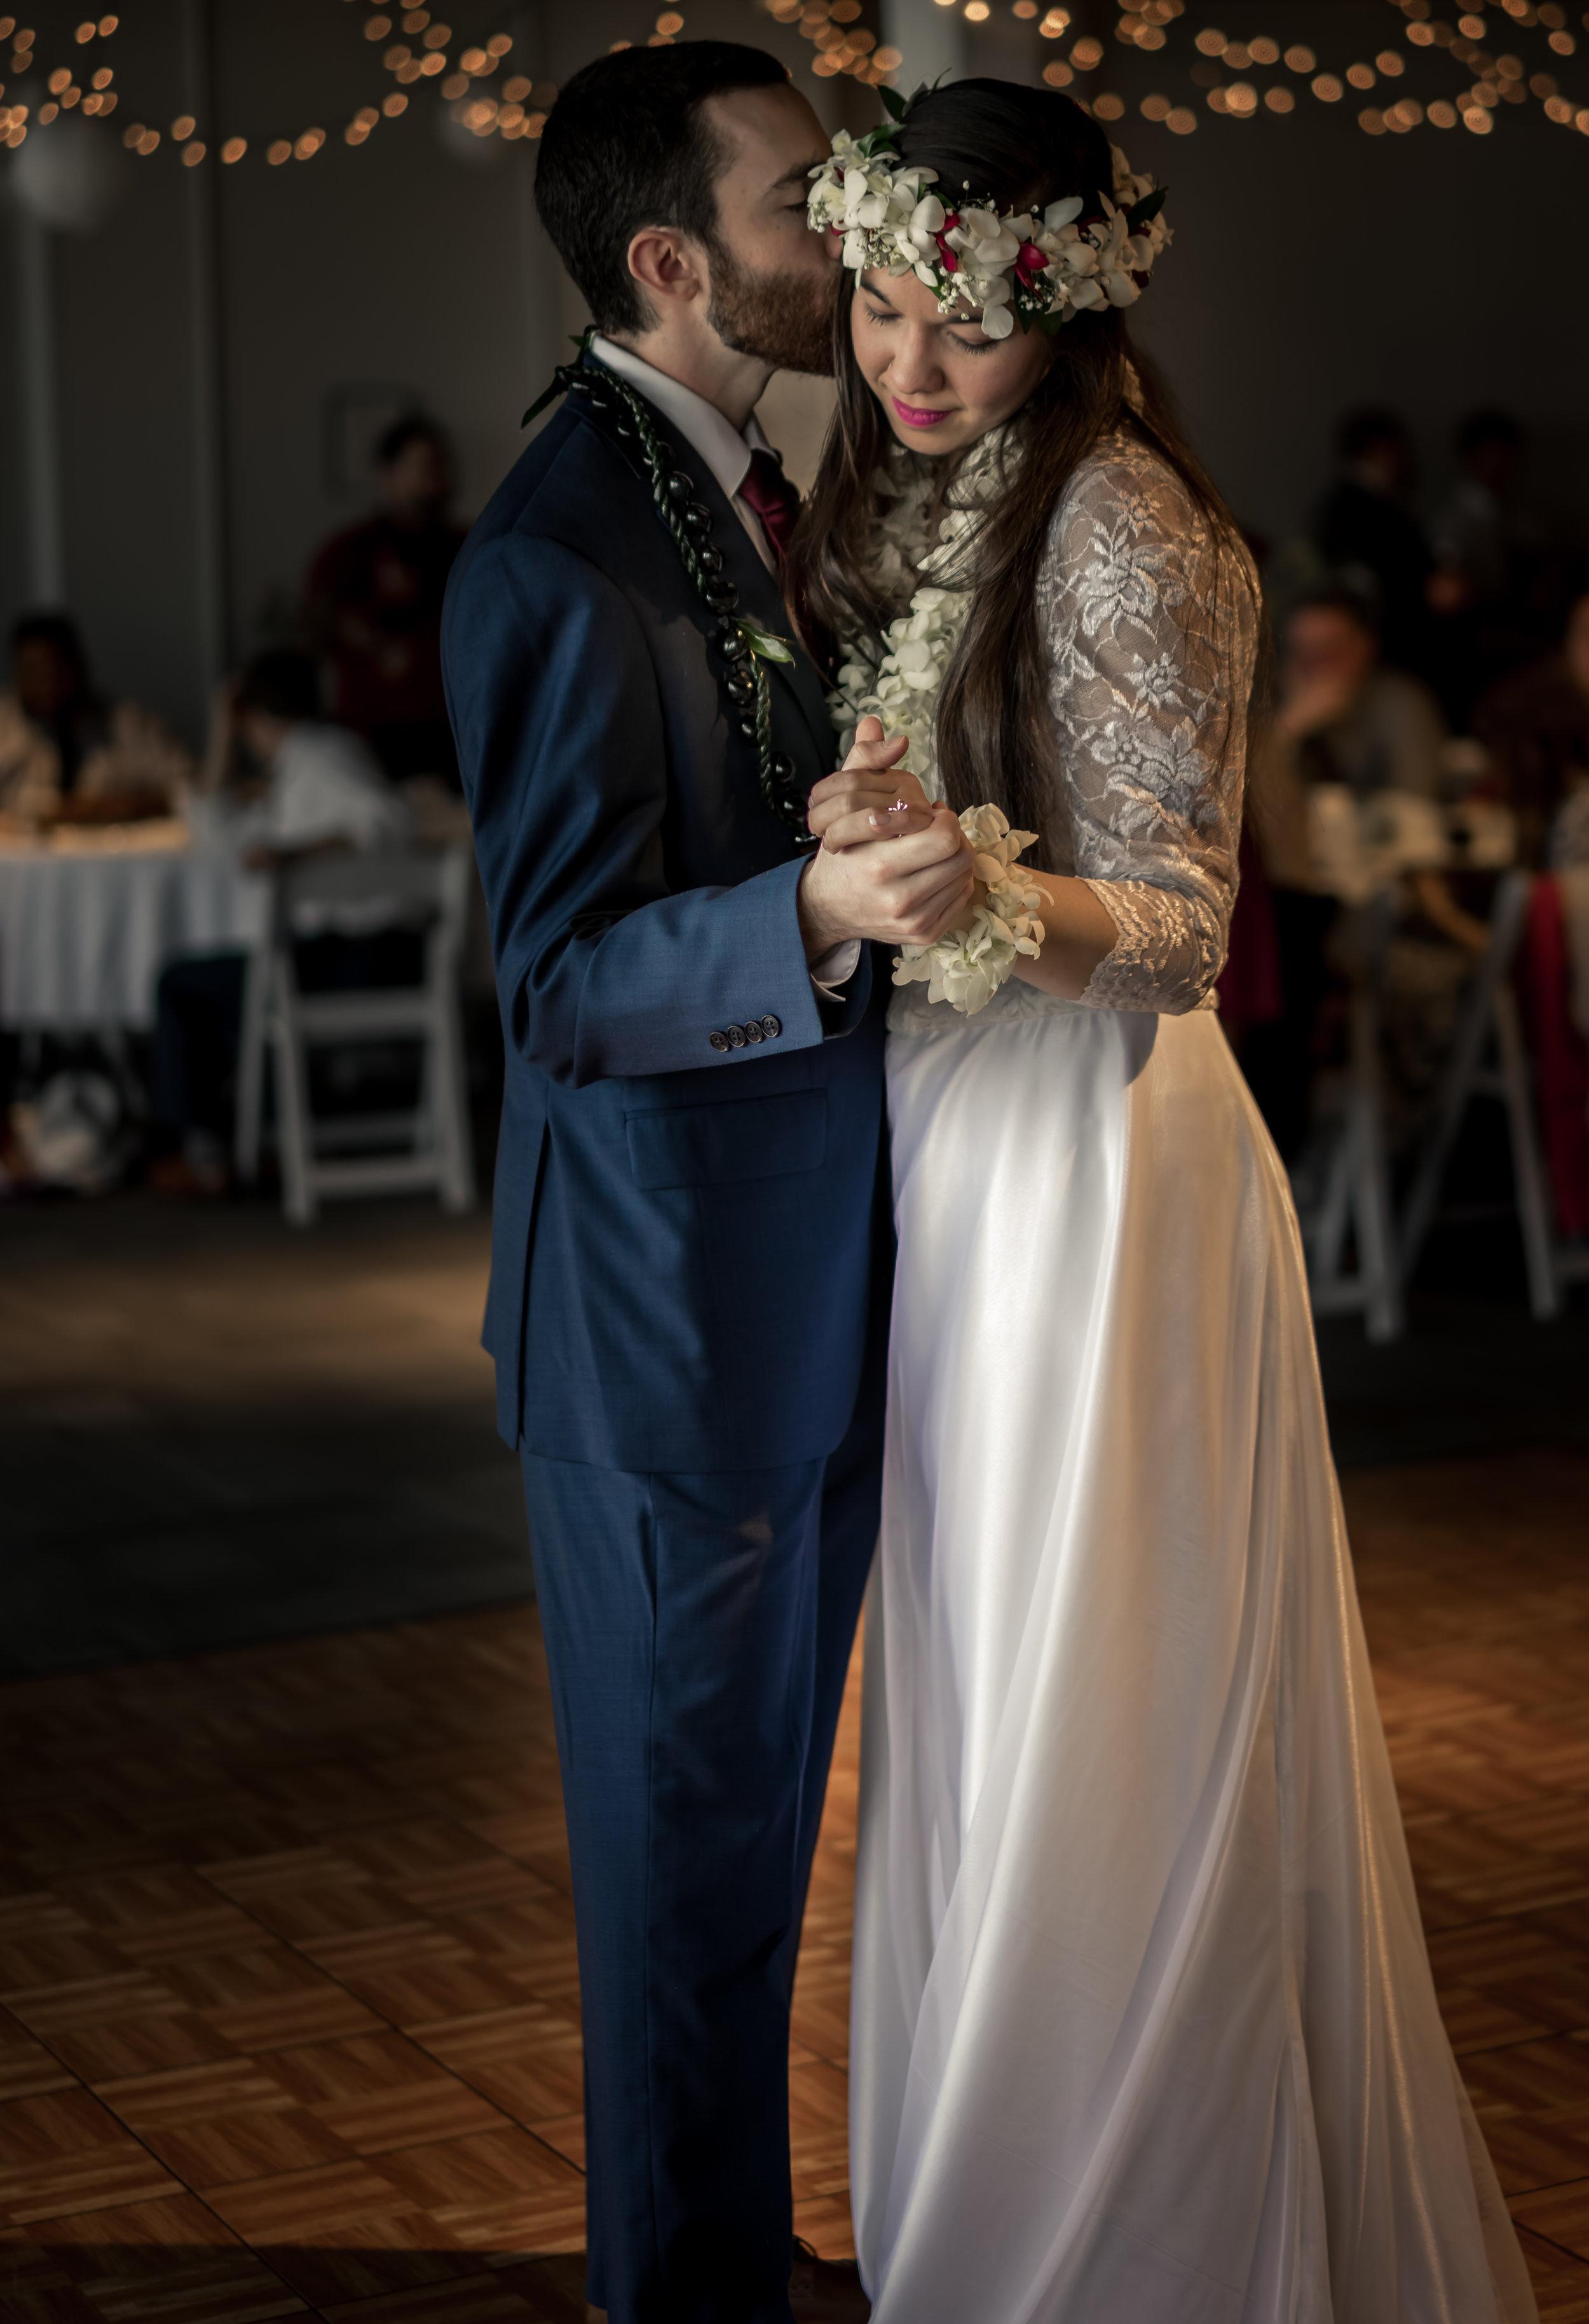 wedding first dance field photo louisville photographer